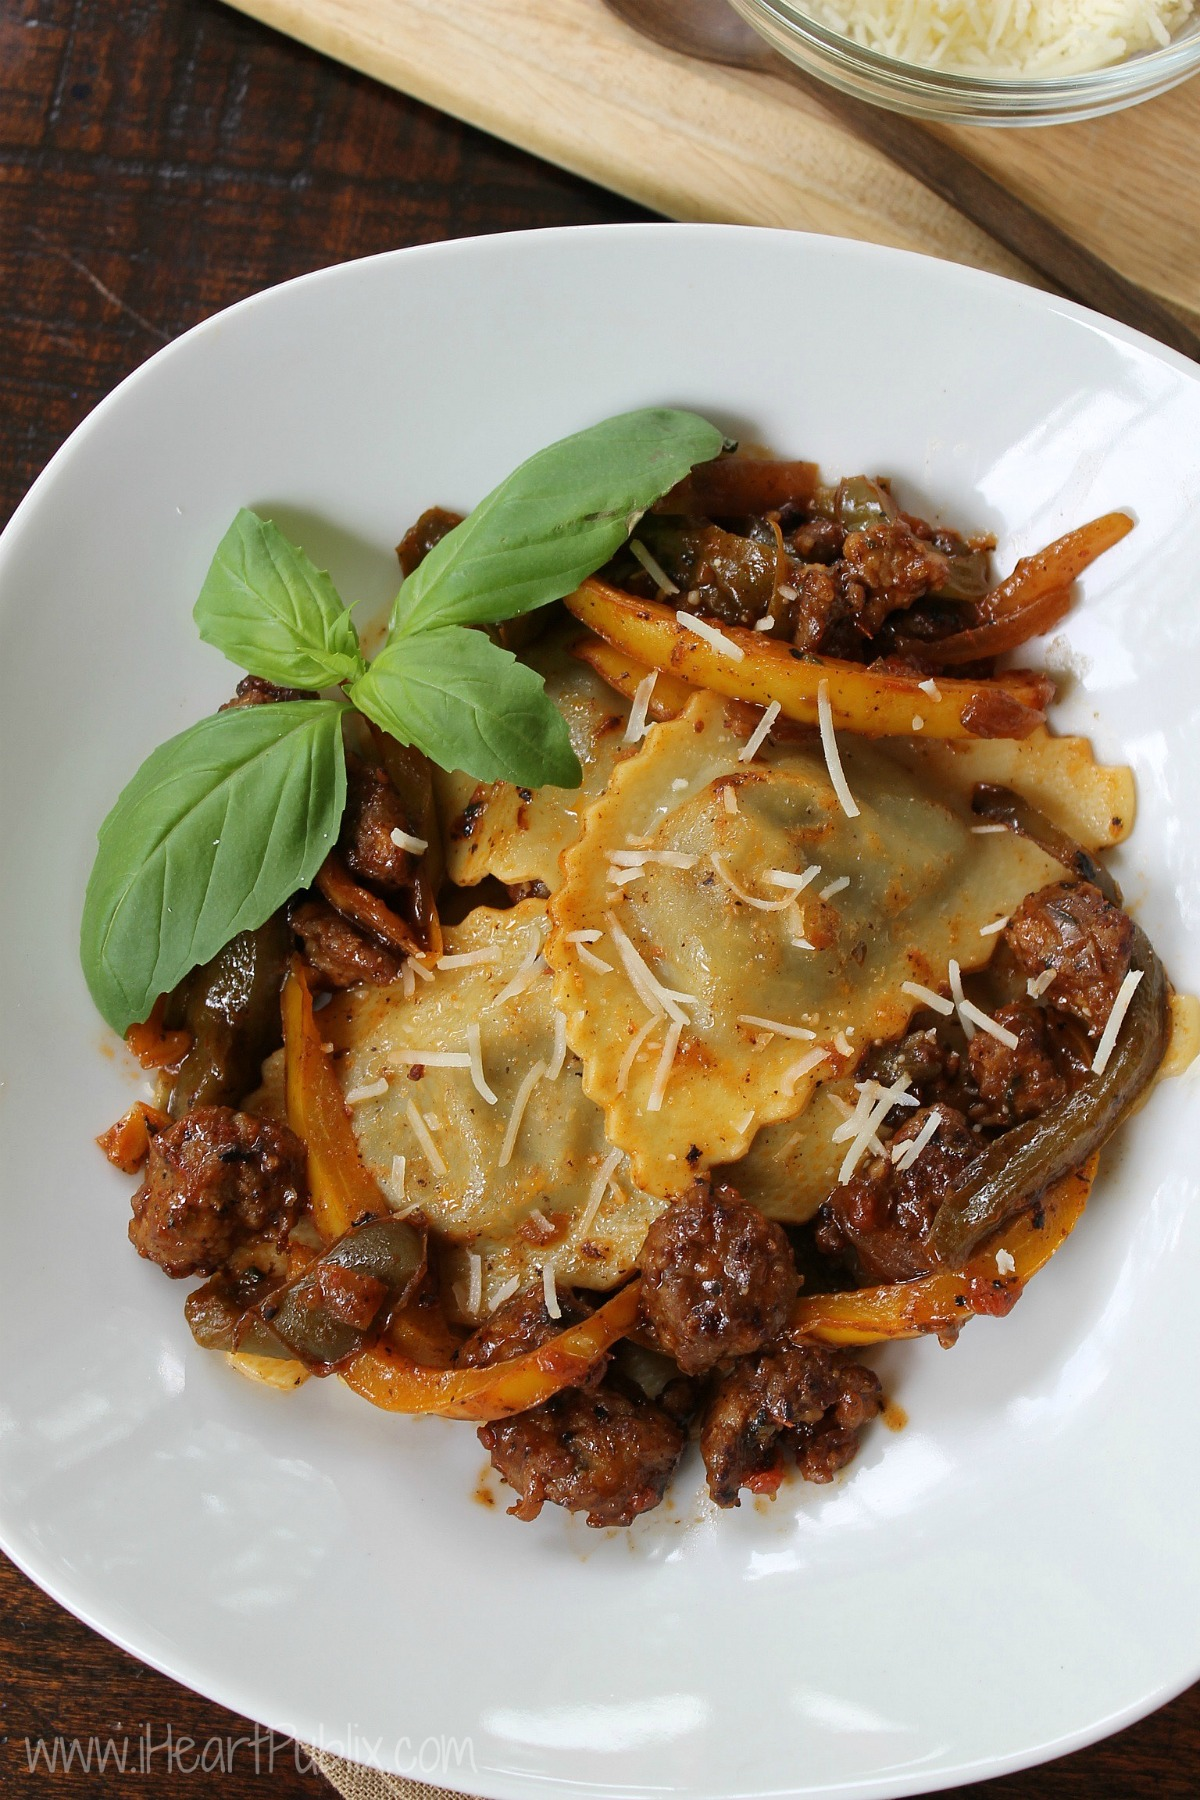 Mushroom Raviolo With Sausage & Peppers